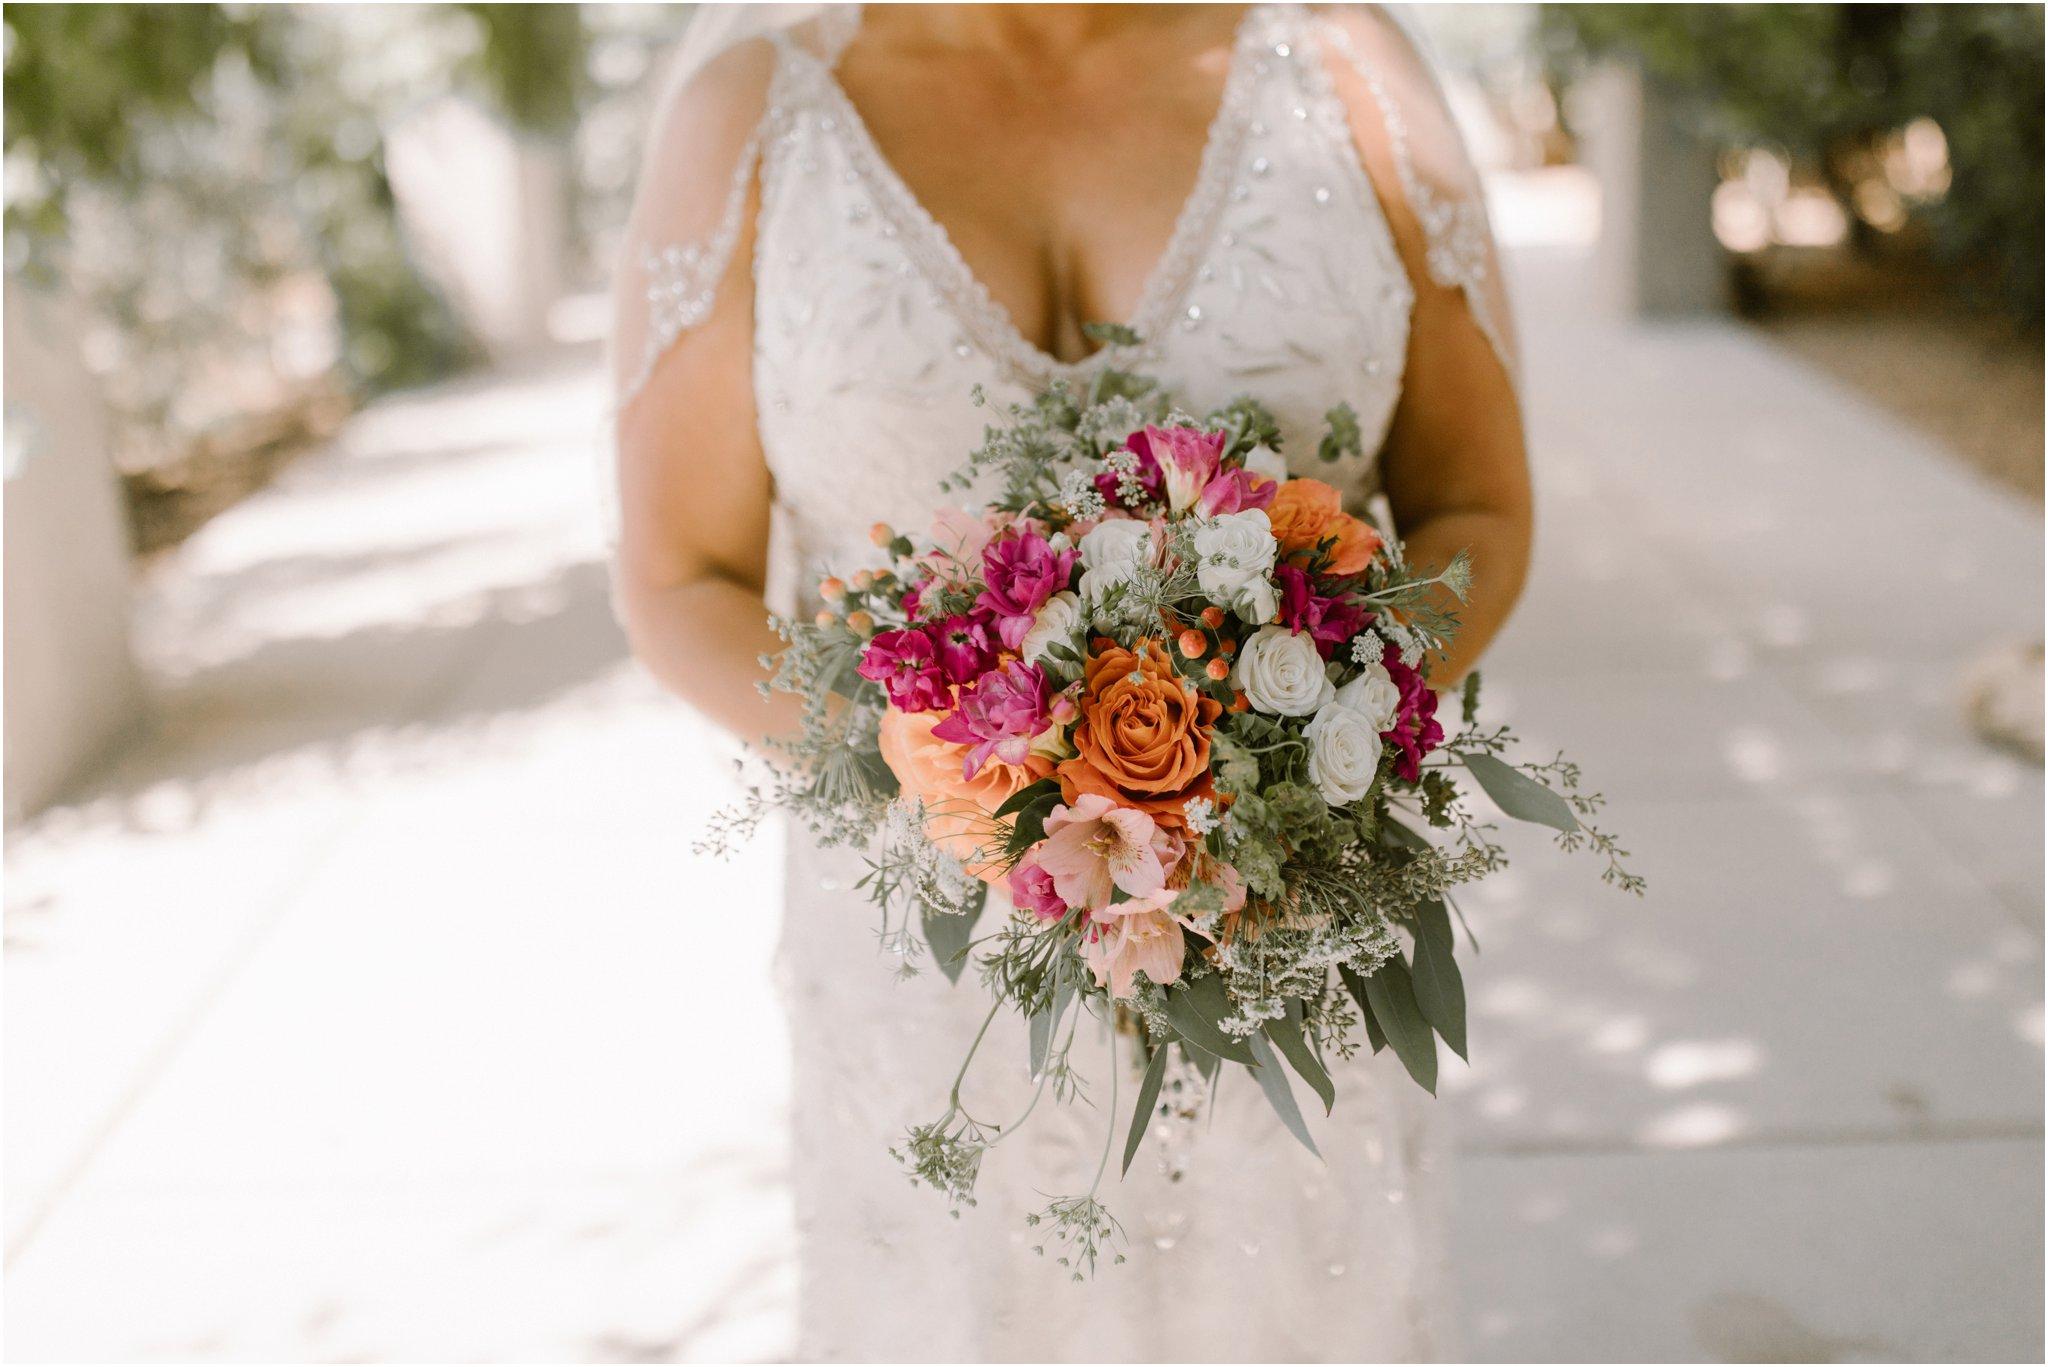 Hotel Albuquerque Wedding, Inn and Spa at Loretto wedding, Santa Fe wedding photographers, blue rose photography